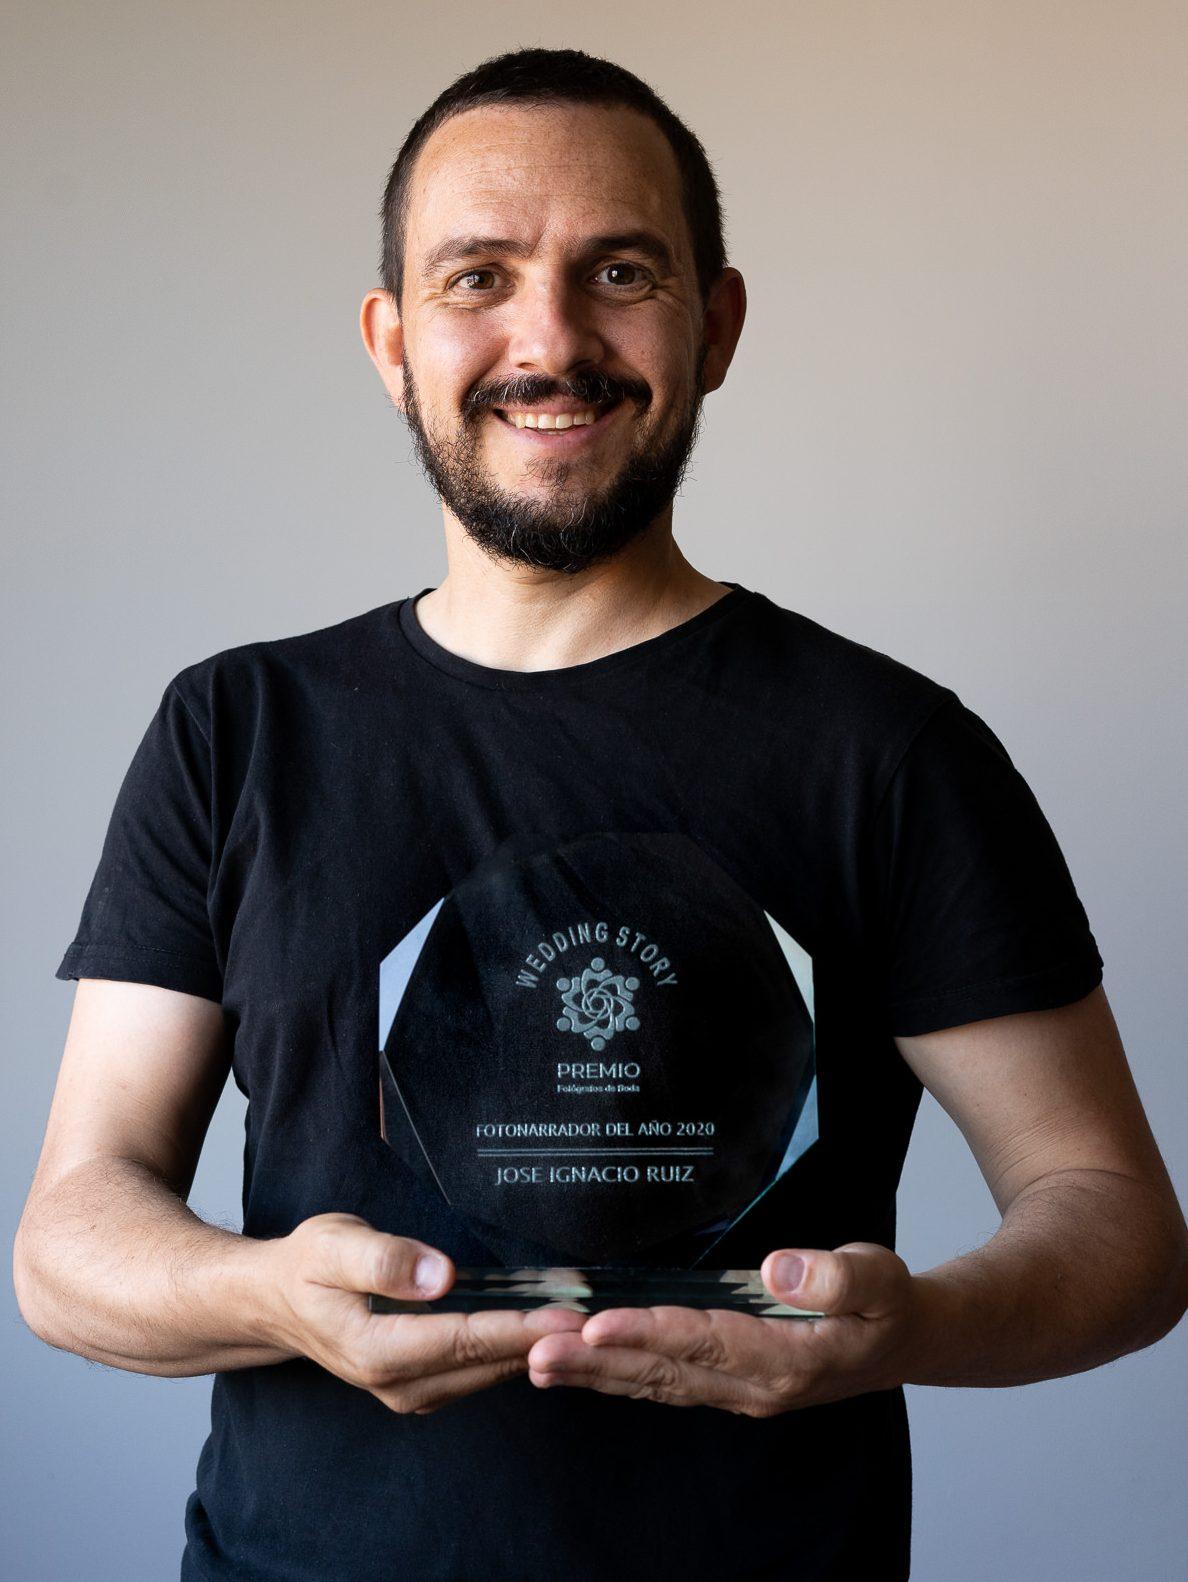 Jose Ignacio Ruiz